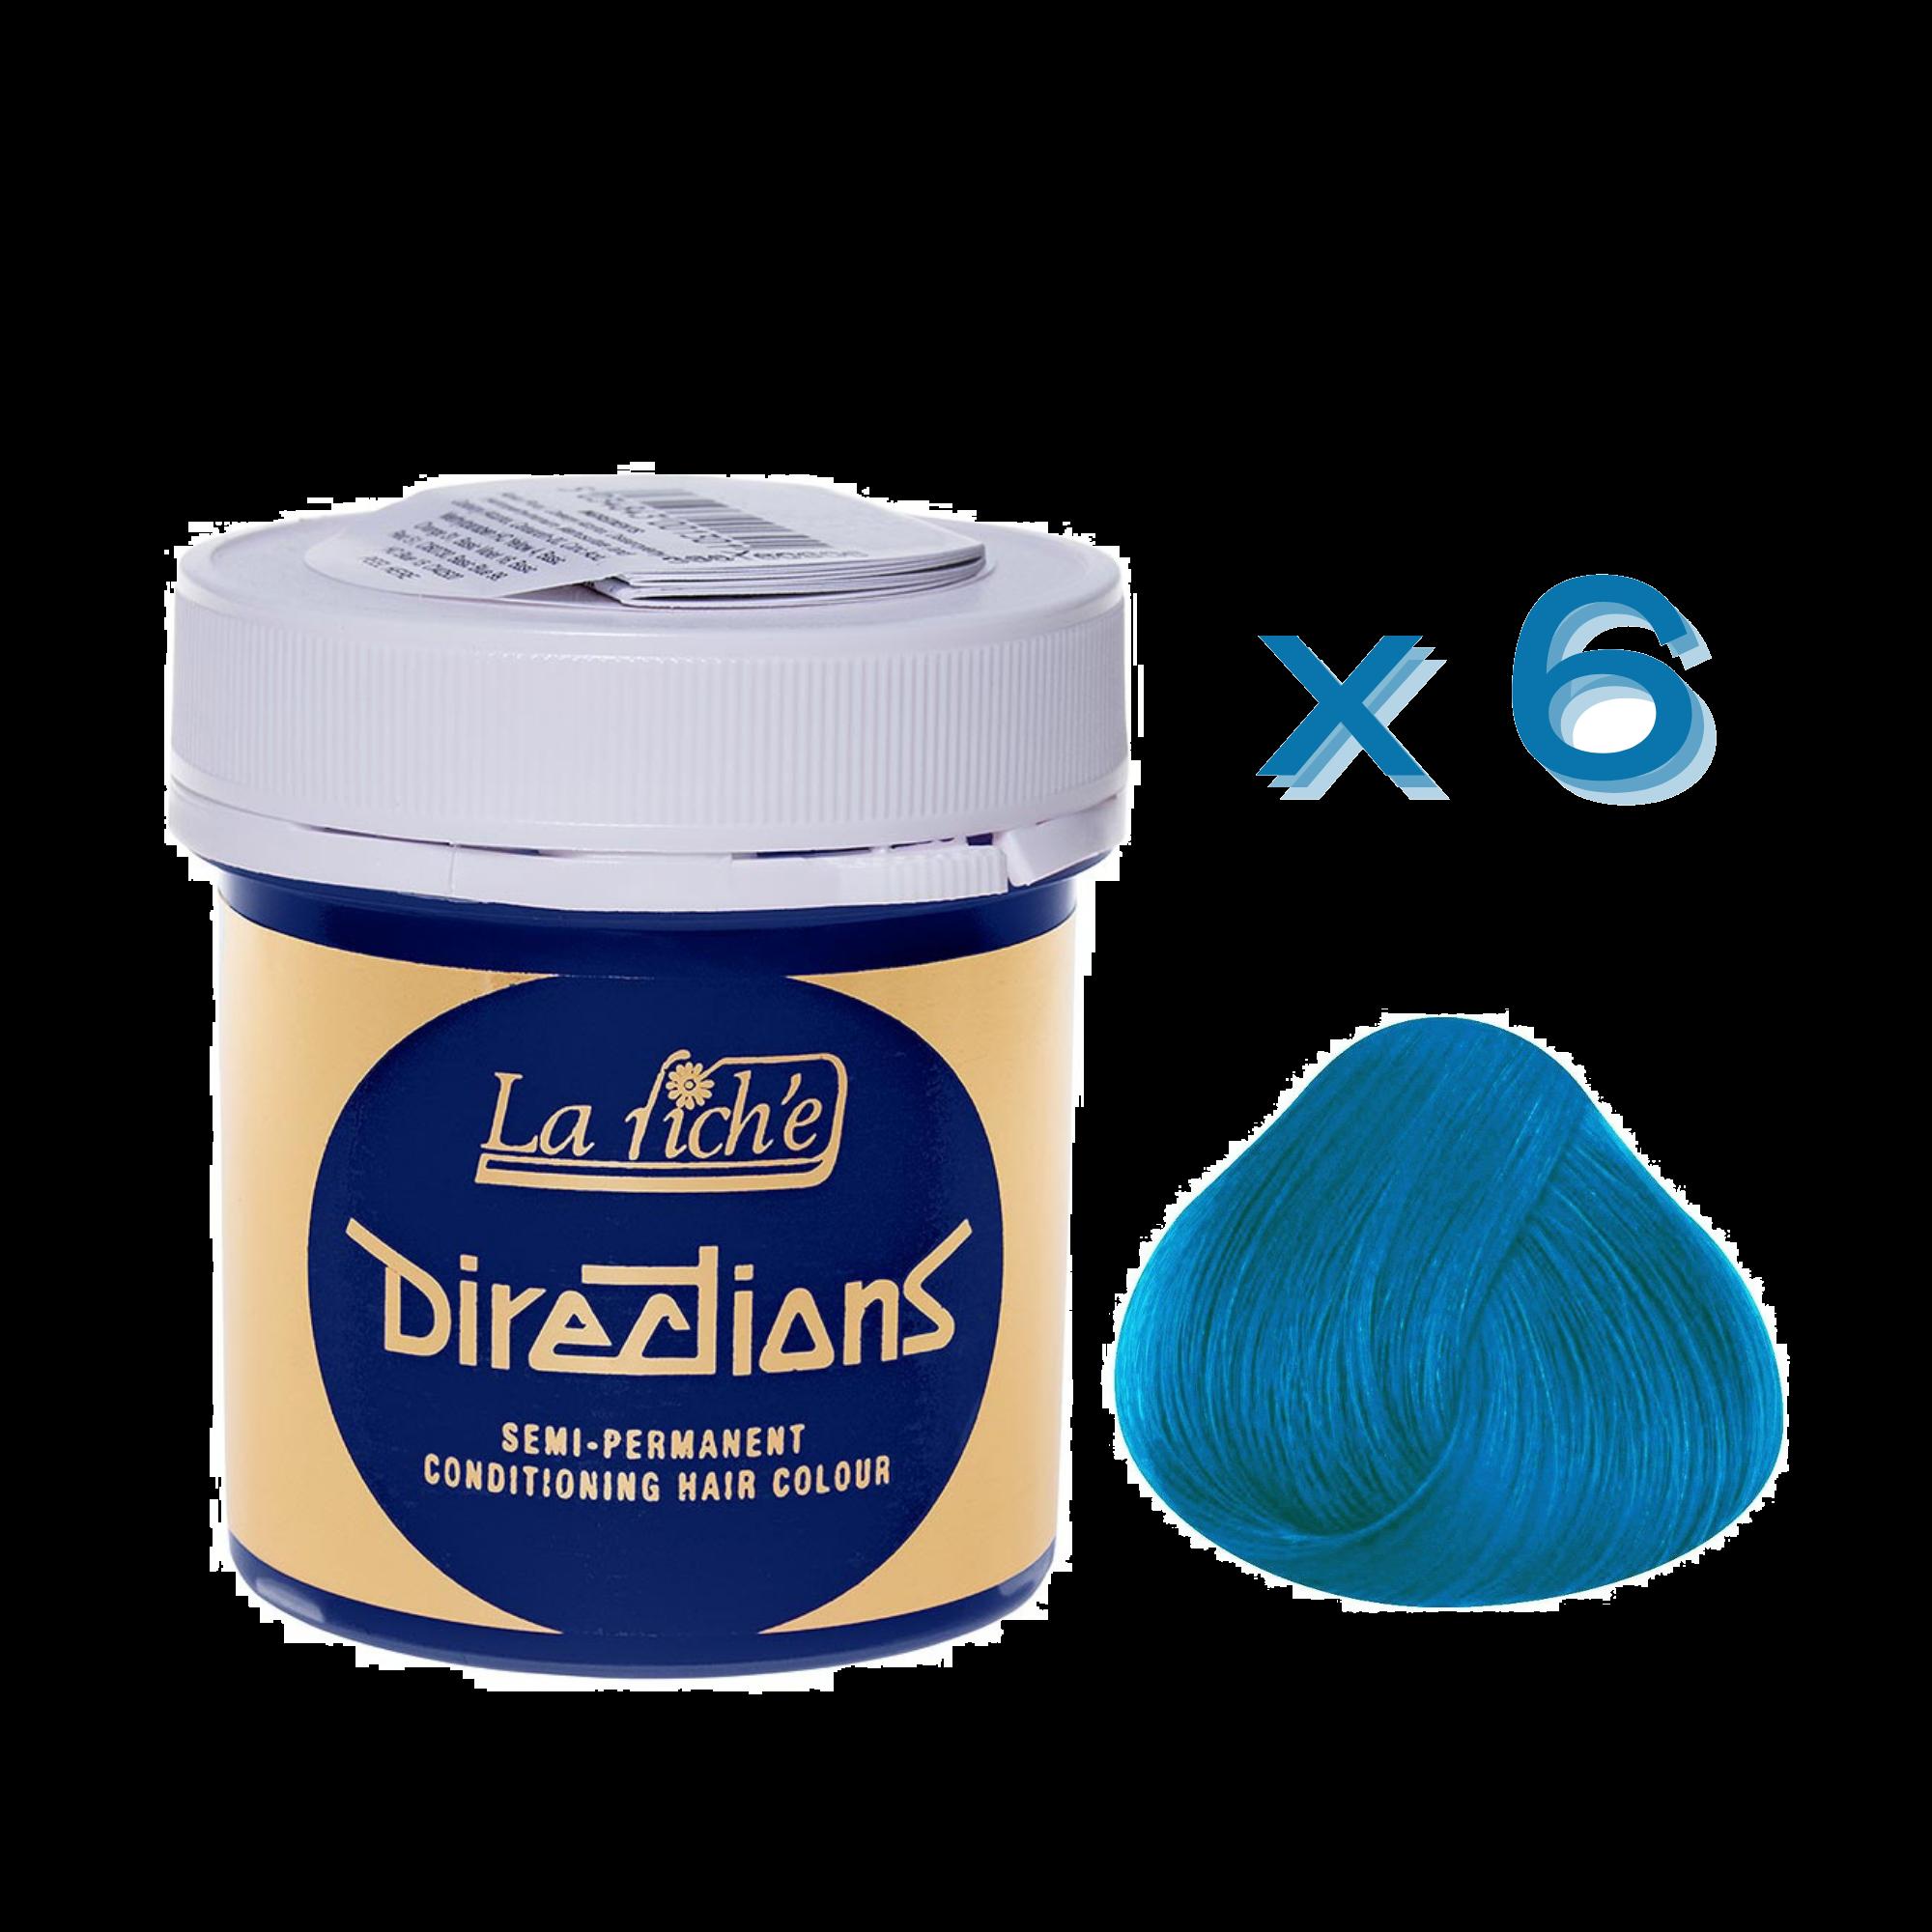 6 x La Riche Directions Semi-Permanent Hair Color 88ml Tubs - LAGOON BLUE